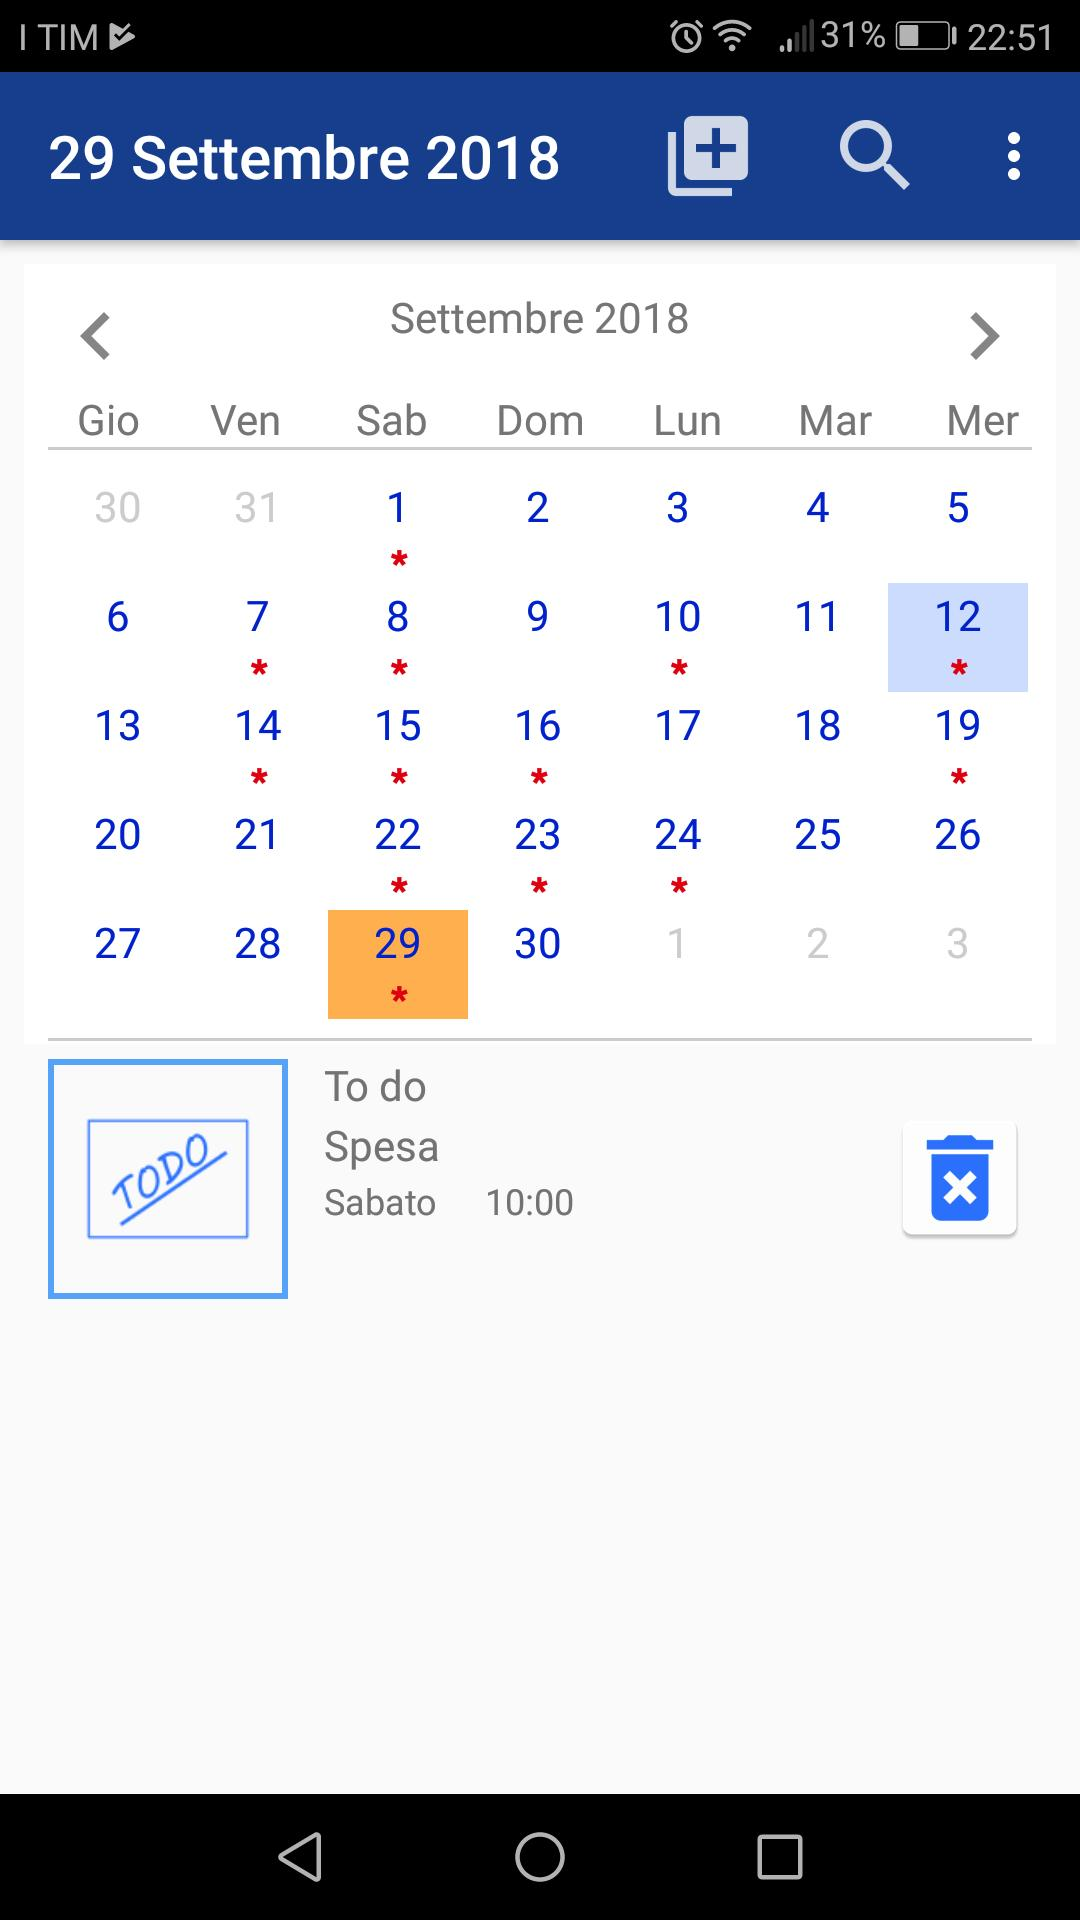 Esportare Calendario Android.Calendario Perpetuo For Android Apk Download